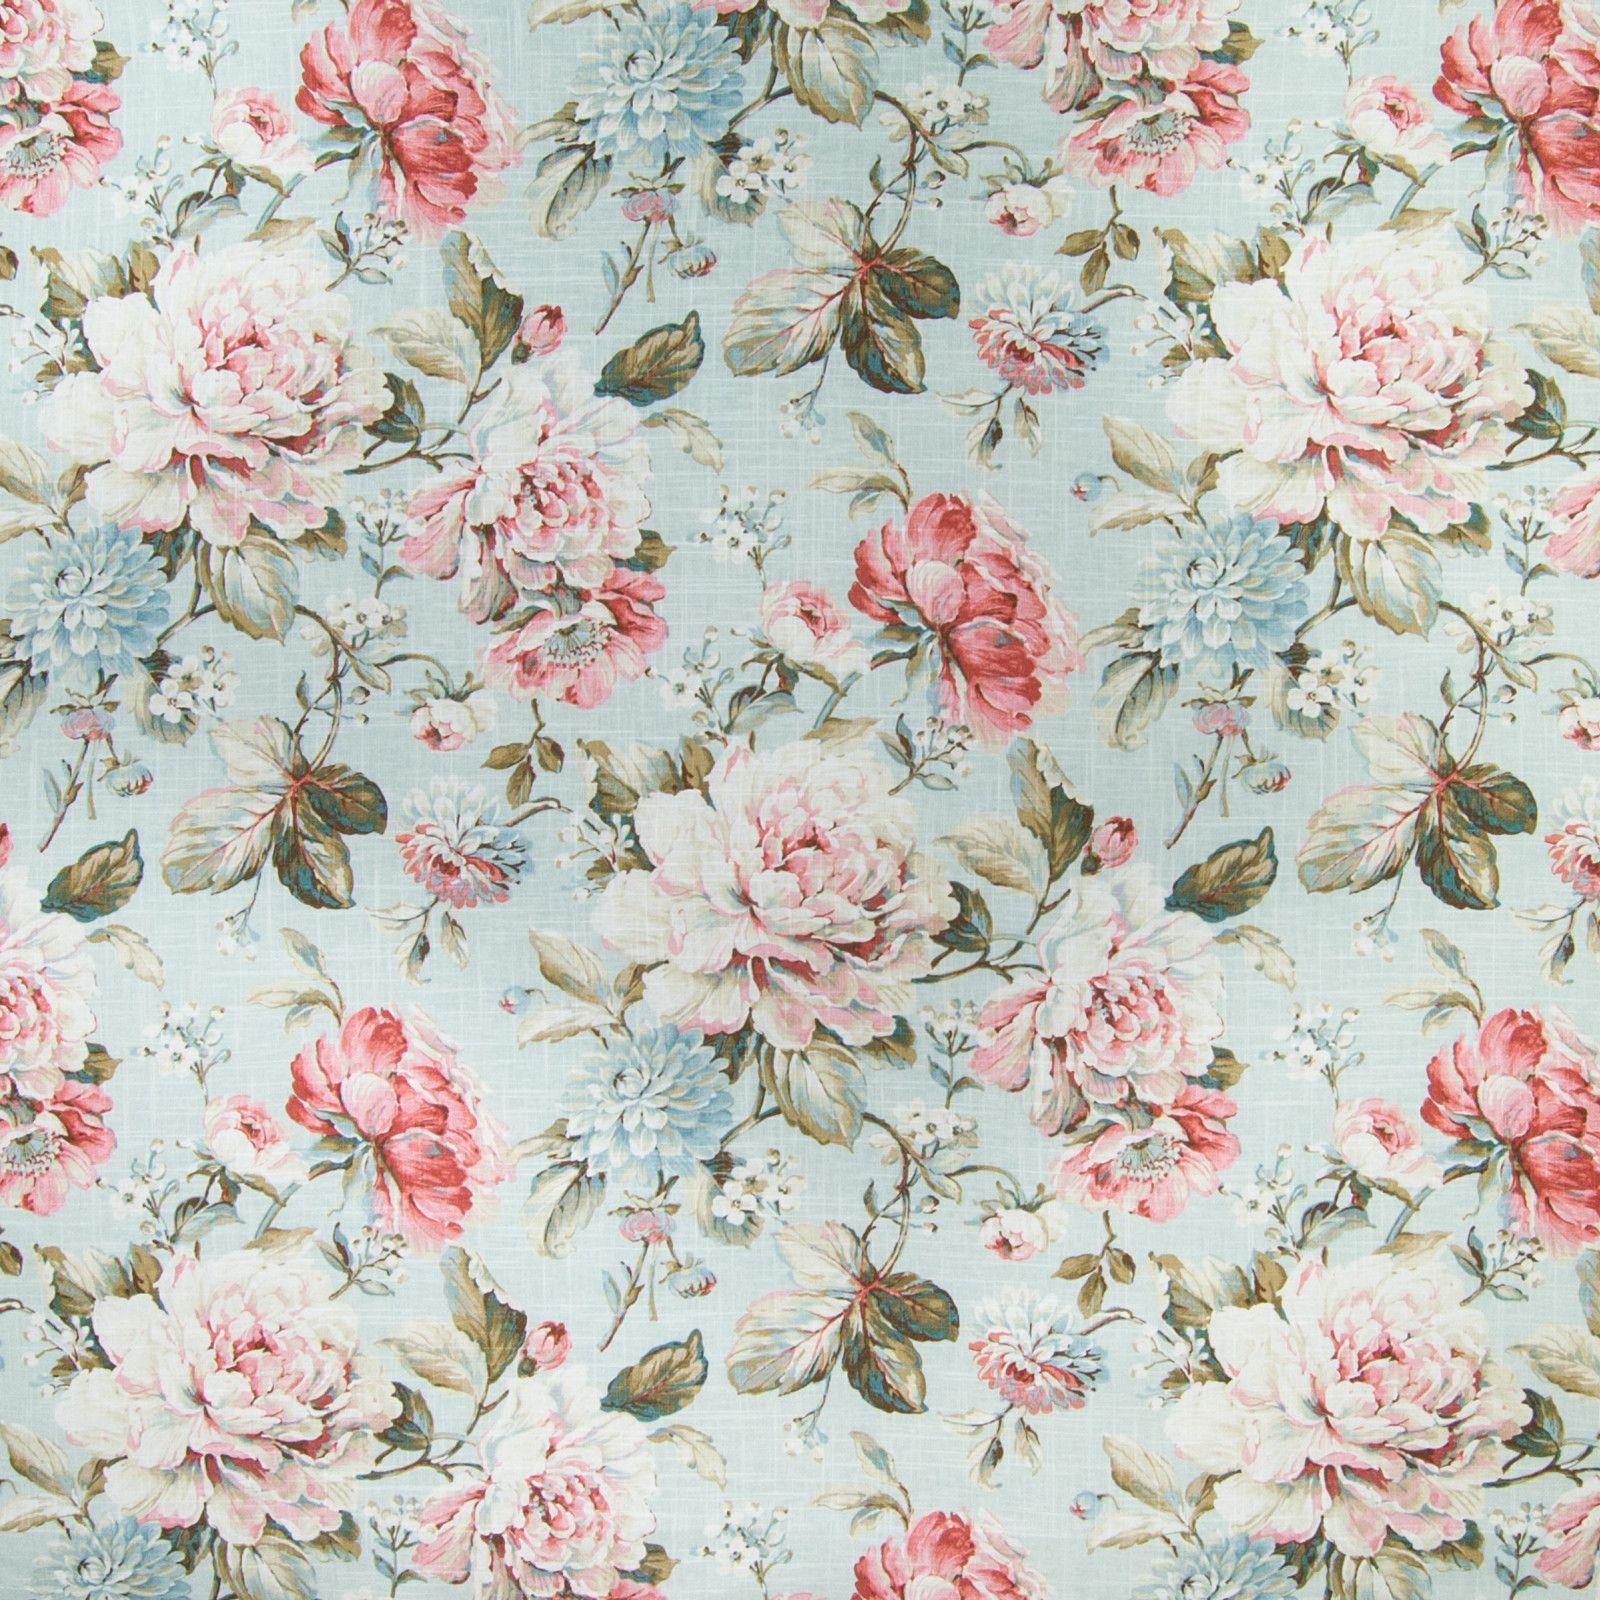 B2347 Silver Sage Greenhouse Fabrics Fabric Decor Floral Fabric